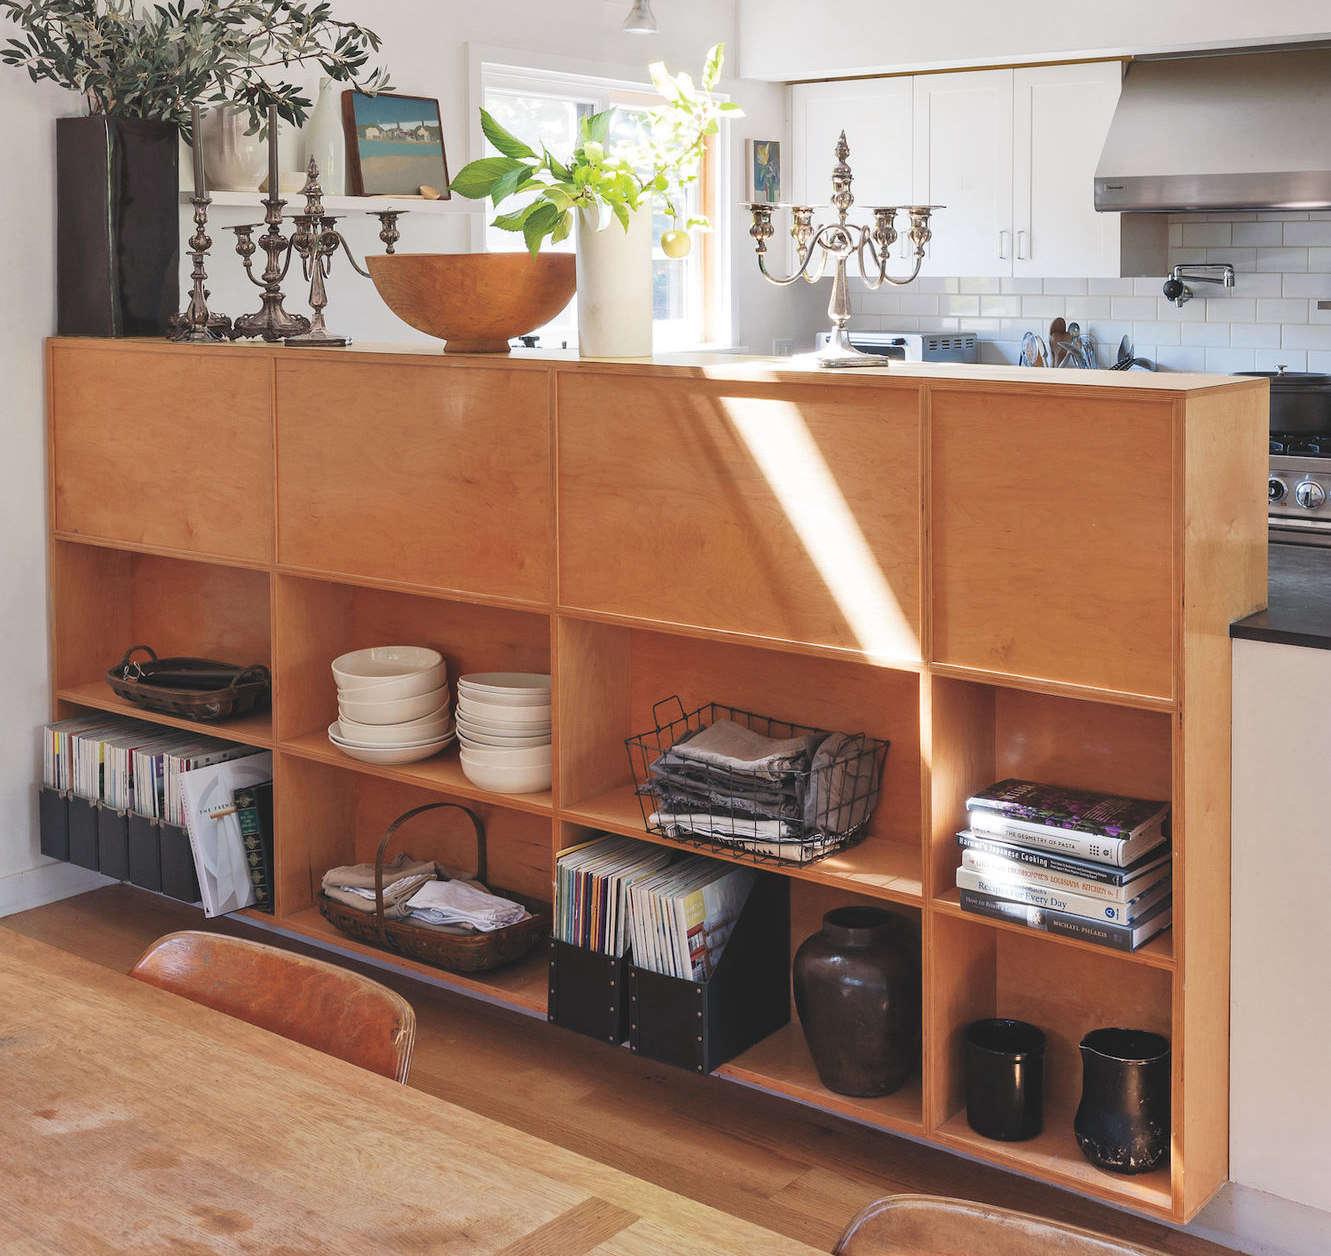 Semi Open Kitchen Designs: Aha! Design: An Ingenious Semi-Open Kitchen In Mill Valley